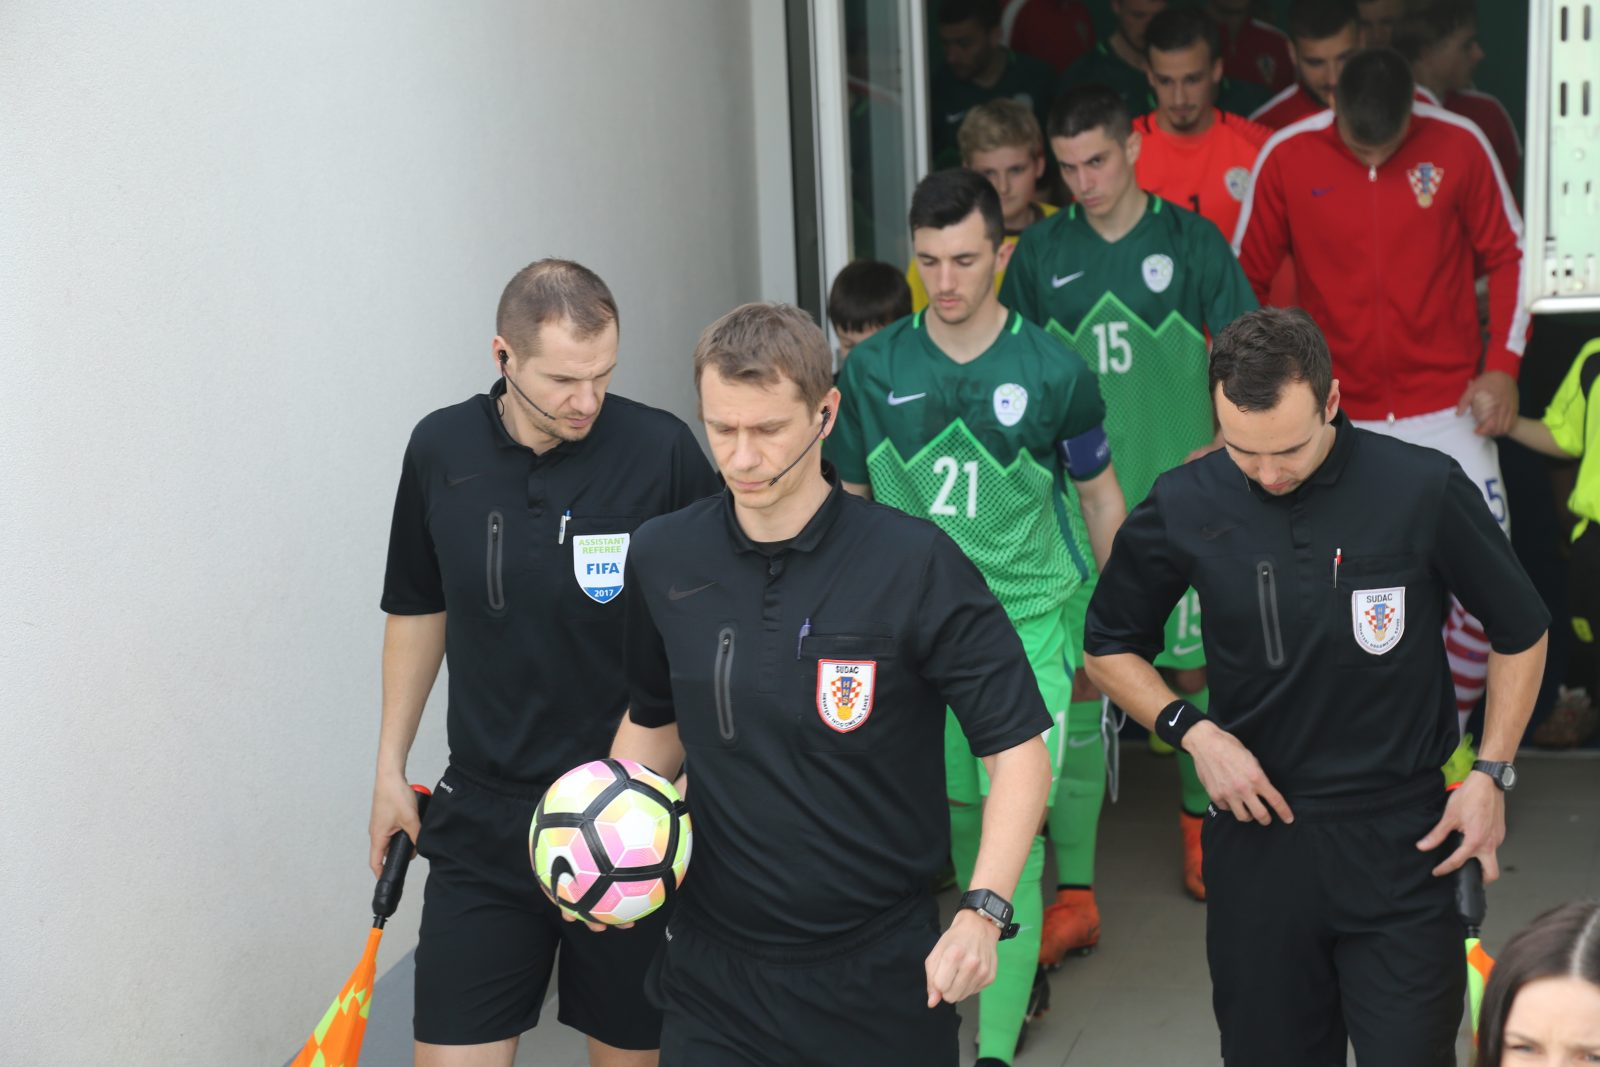 Hrvatska-Slovenija U21 u Nedelišću